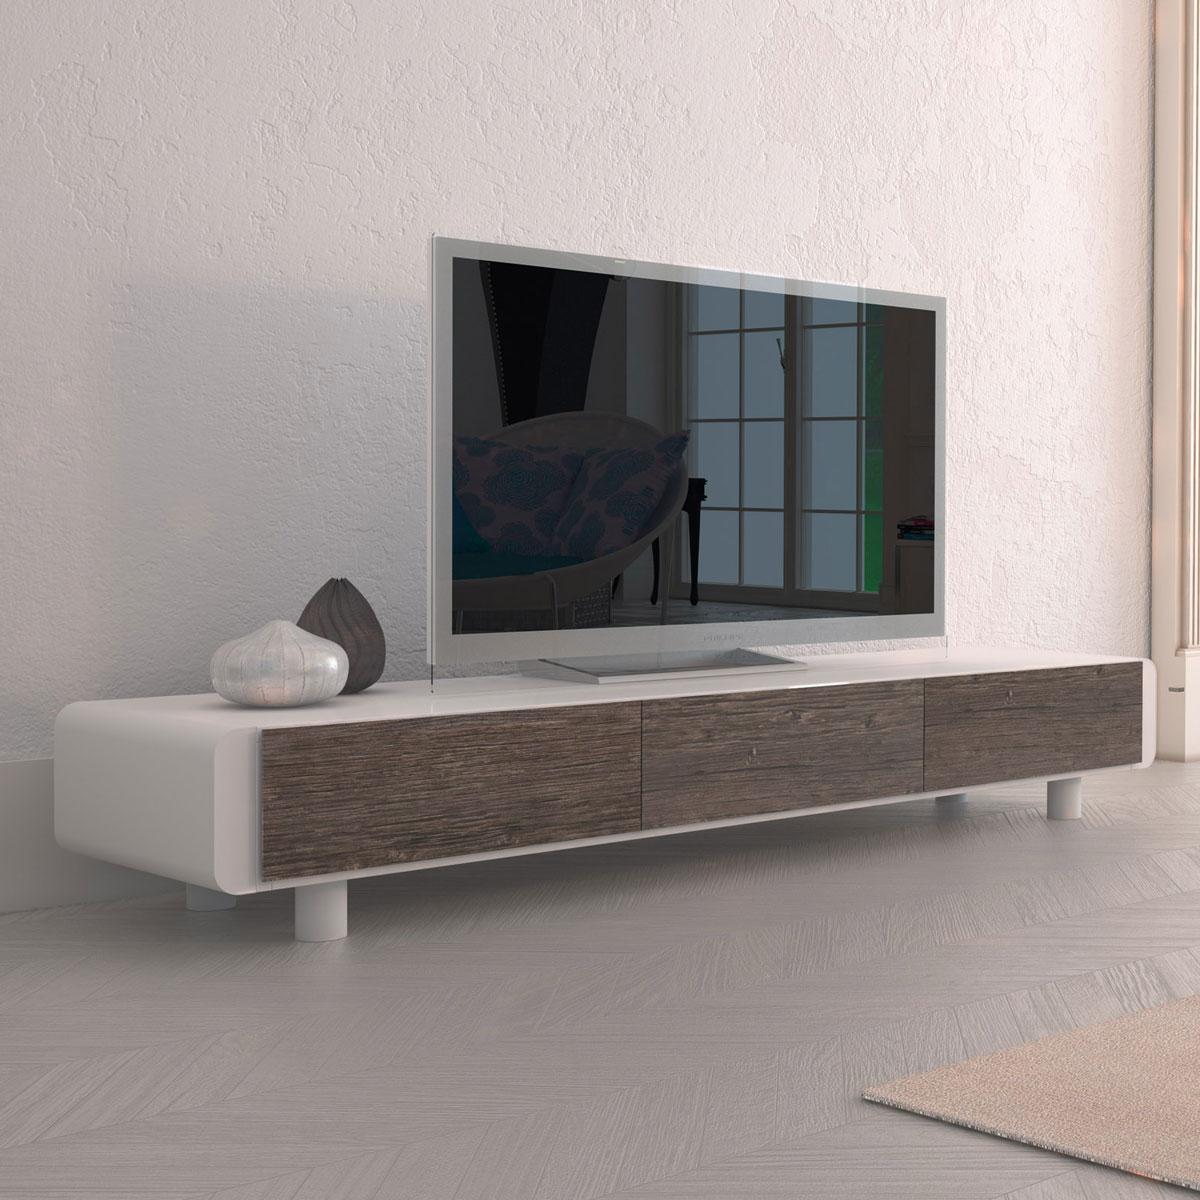 Tv Board Weiß Eiche | Lowboard Cabrera In Weiß 100 Cm ...